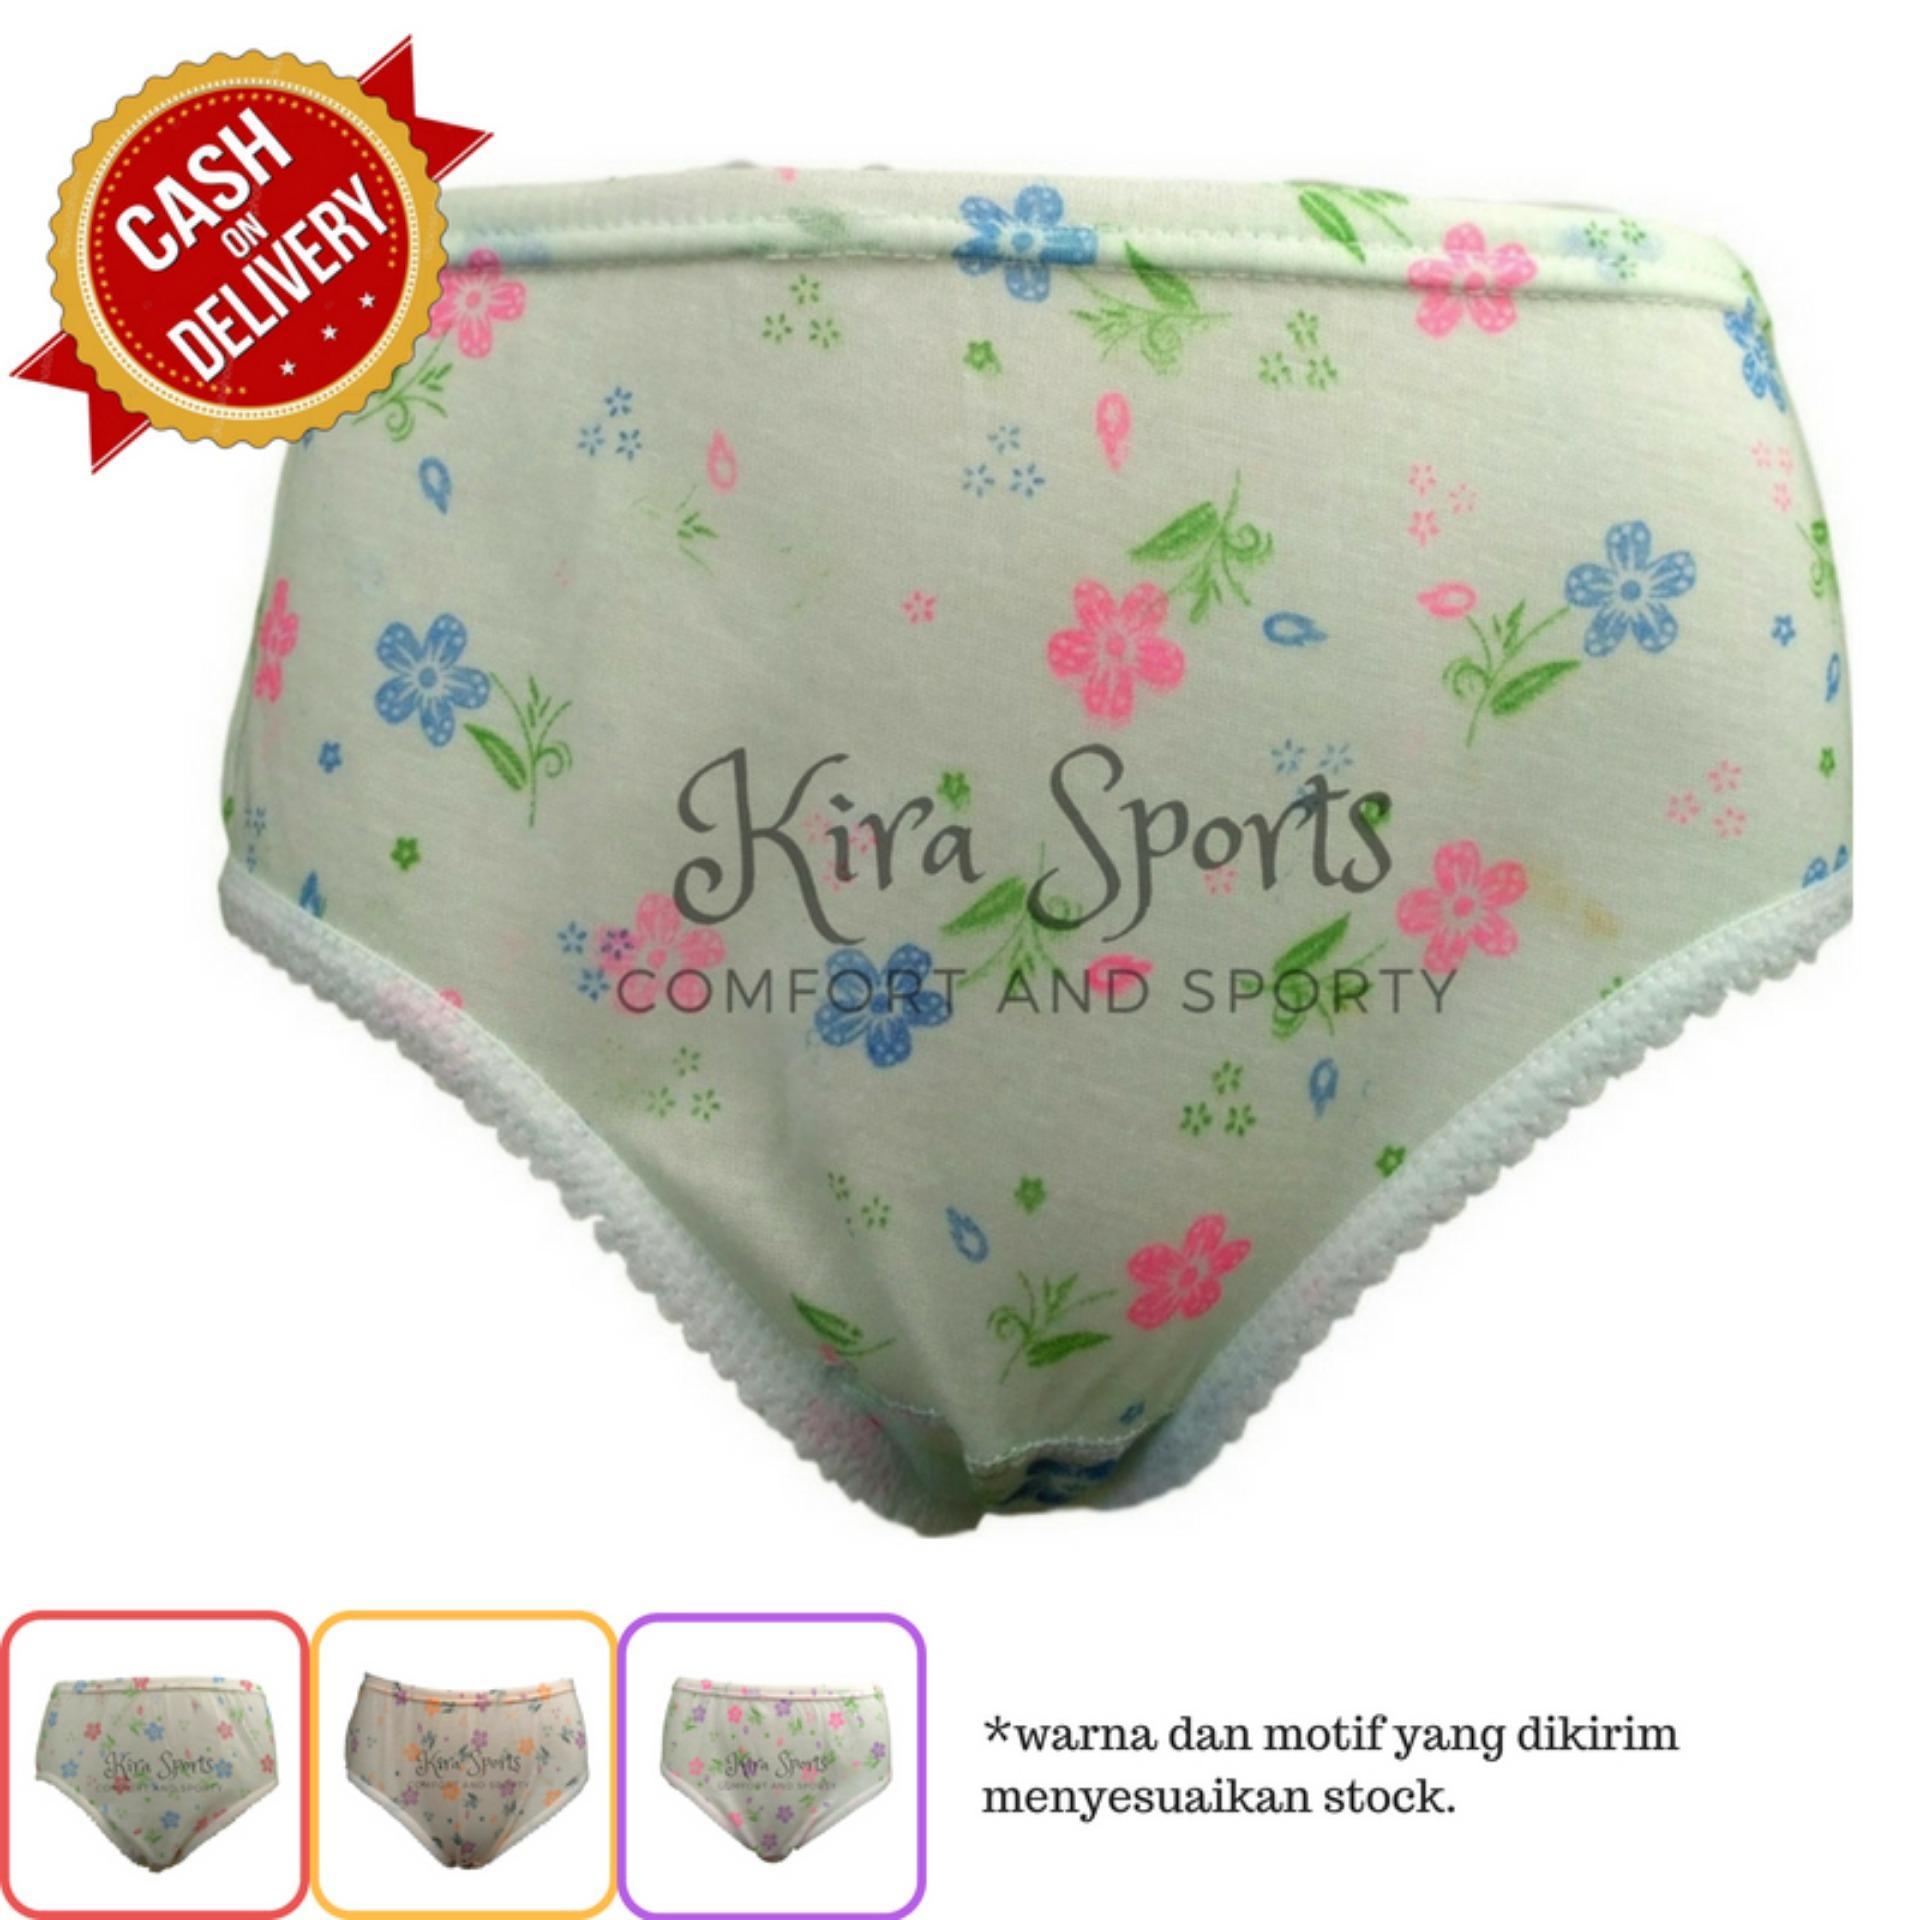 Kira Sports Celana Dalam Wanita Sexy / Bukan Merk Sorex Transparan G-string Untuk Ibu hamil / Aneka Motif Bunga Renda Seksi Terbaru/ Dalaman Perempuan Katun Dewasa dan Anak Murah ANK701 - Bisa COD